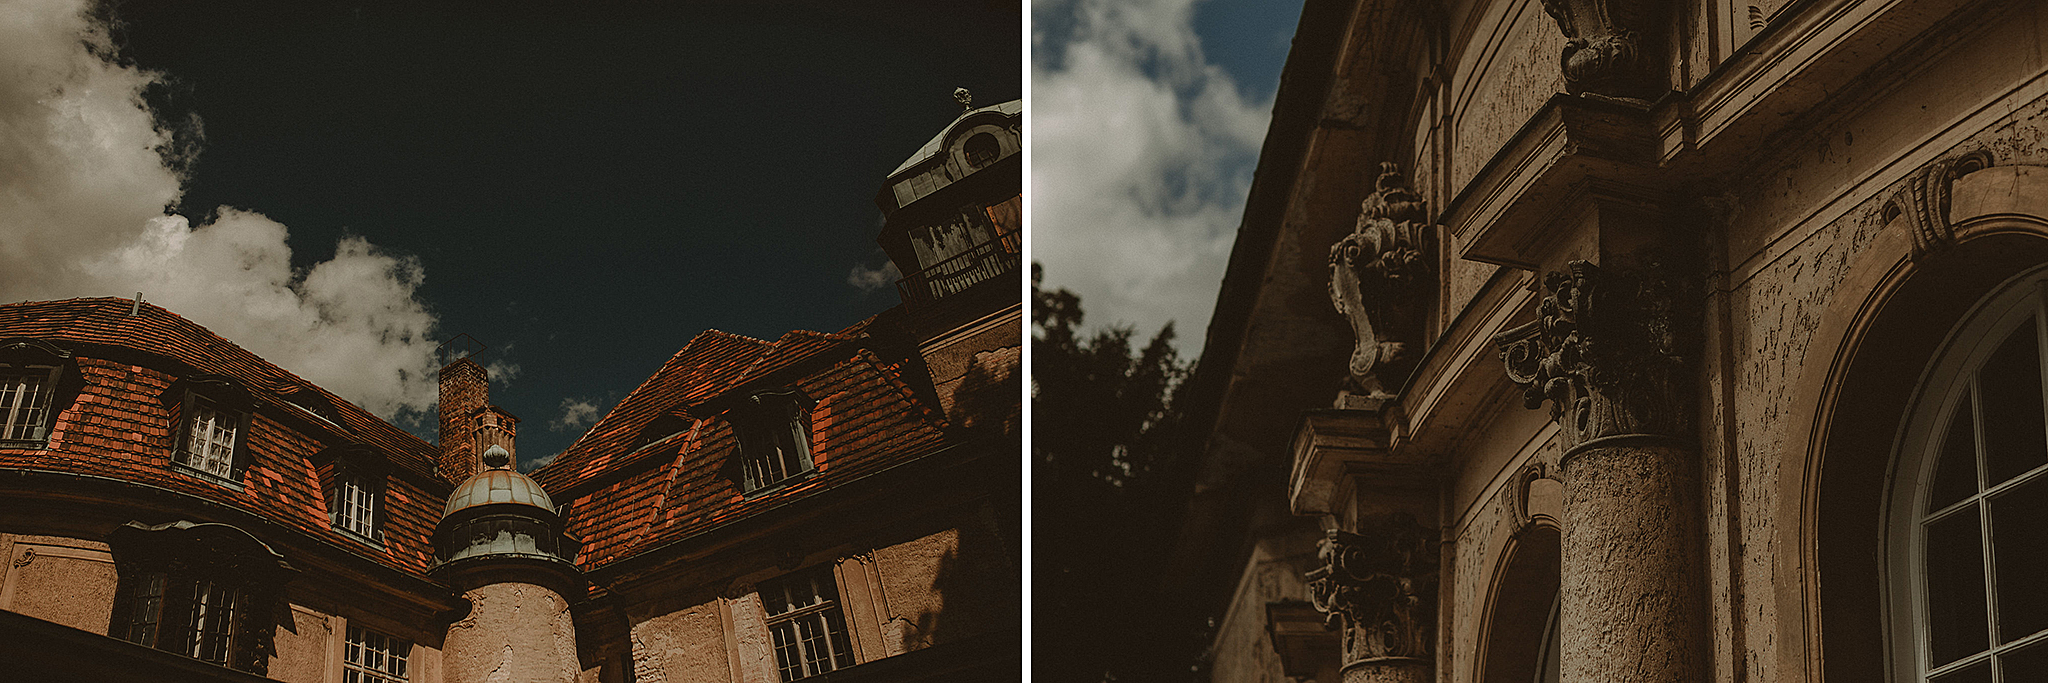 Potsdam_Hochzeitsfotograf_